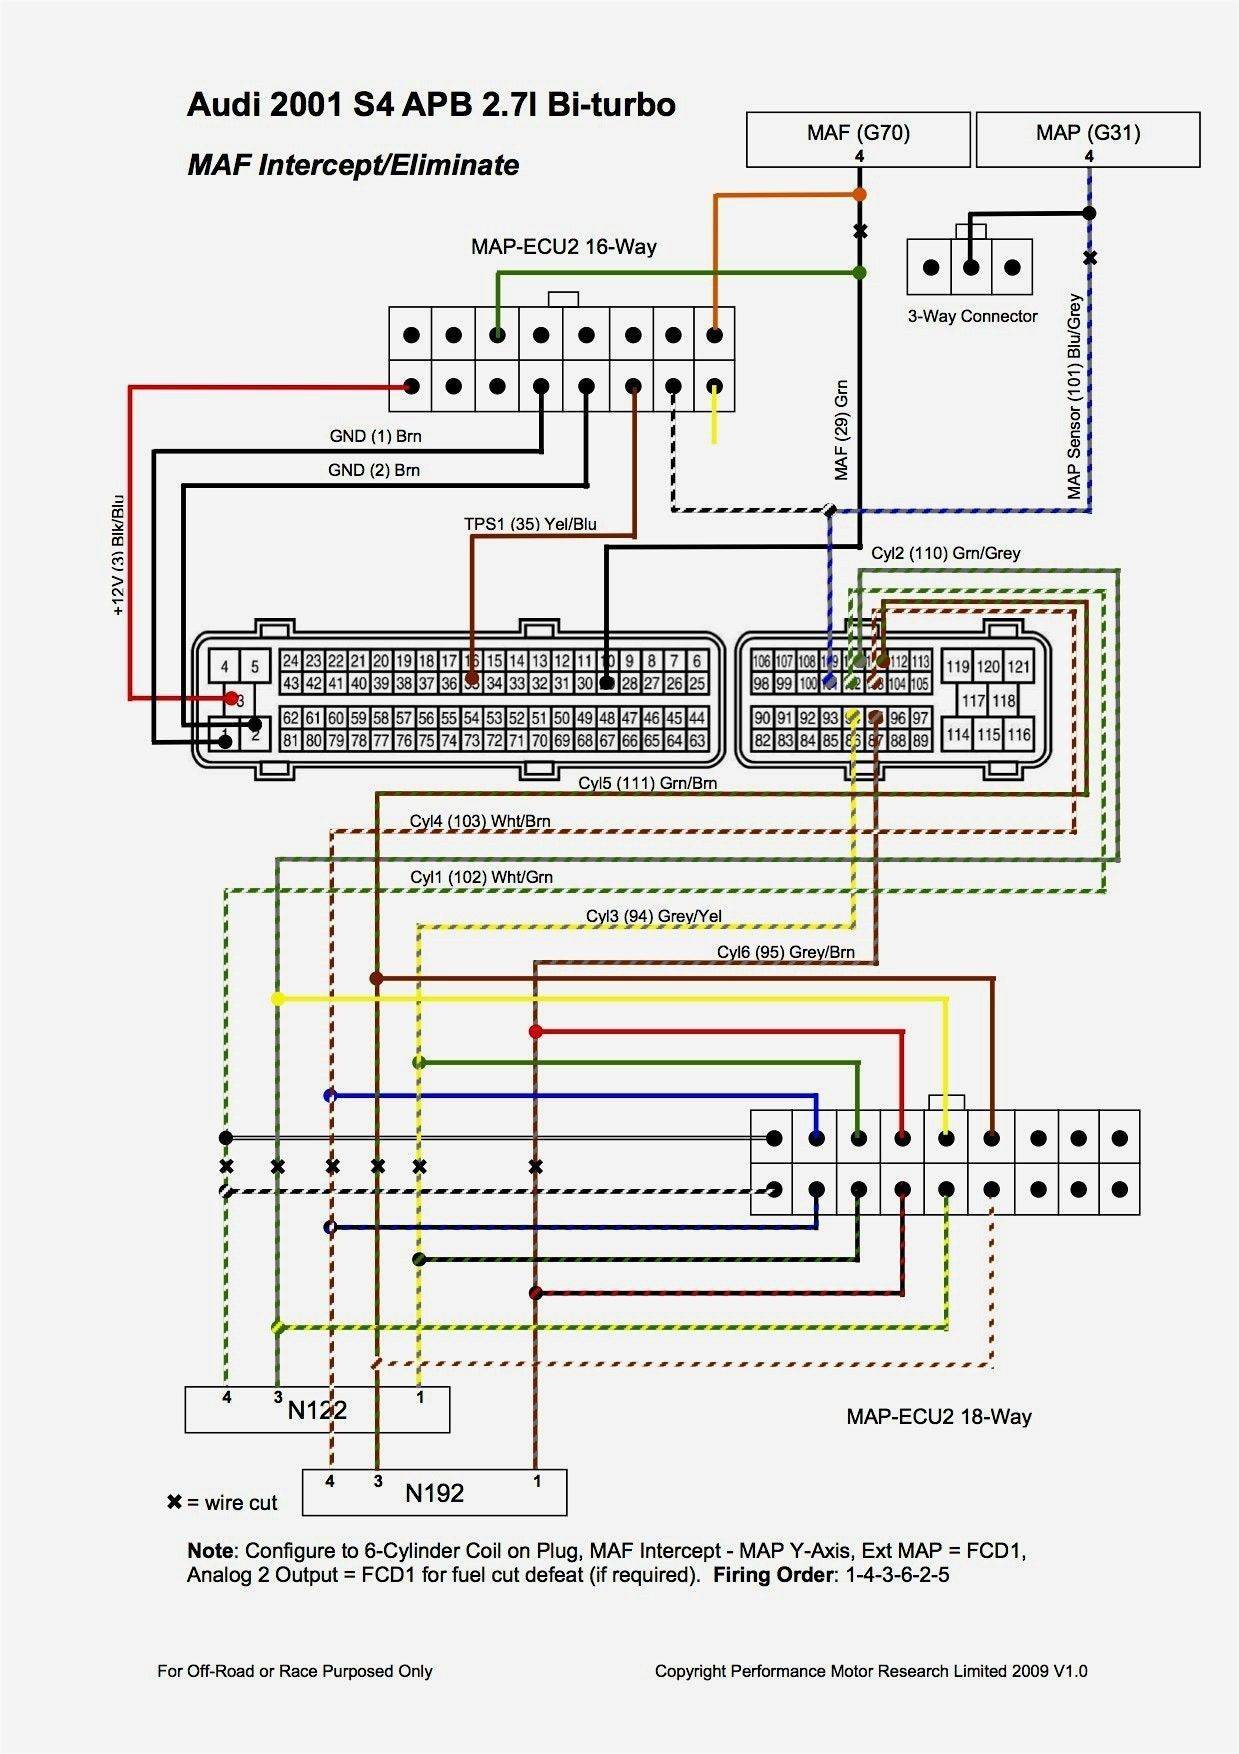 Wiring Diagram For Car Stereo Diagram Diagramtemplate Diagramsample Diagrama De Circuito Electrico Diagrama De Circuito Circuito Electrico